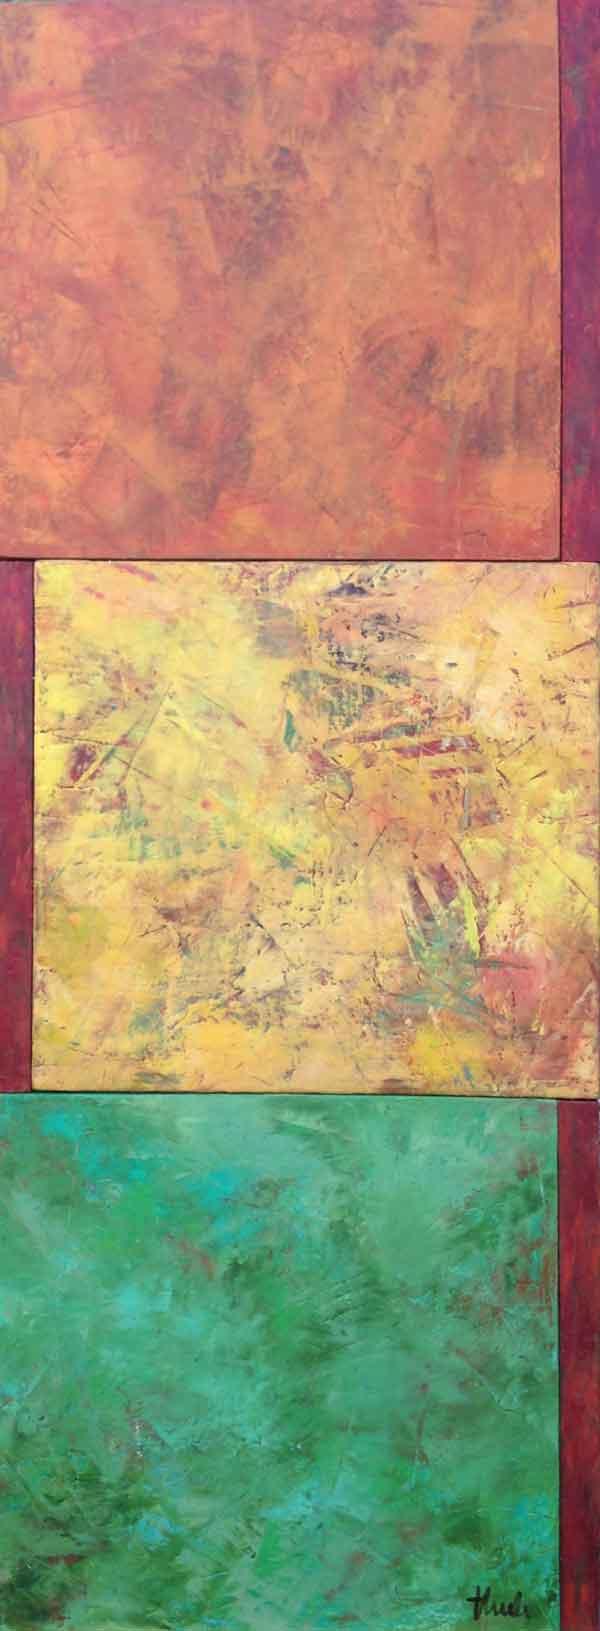 "Changing Seasons  Oil & Wax, 11"" x 30"", 2016  $350"